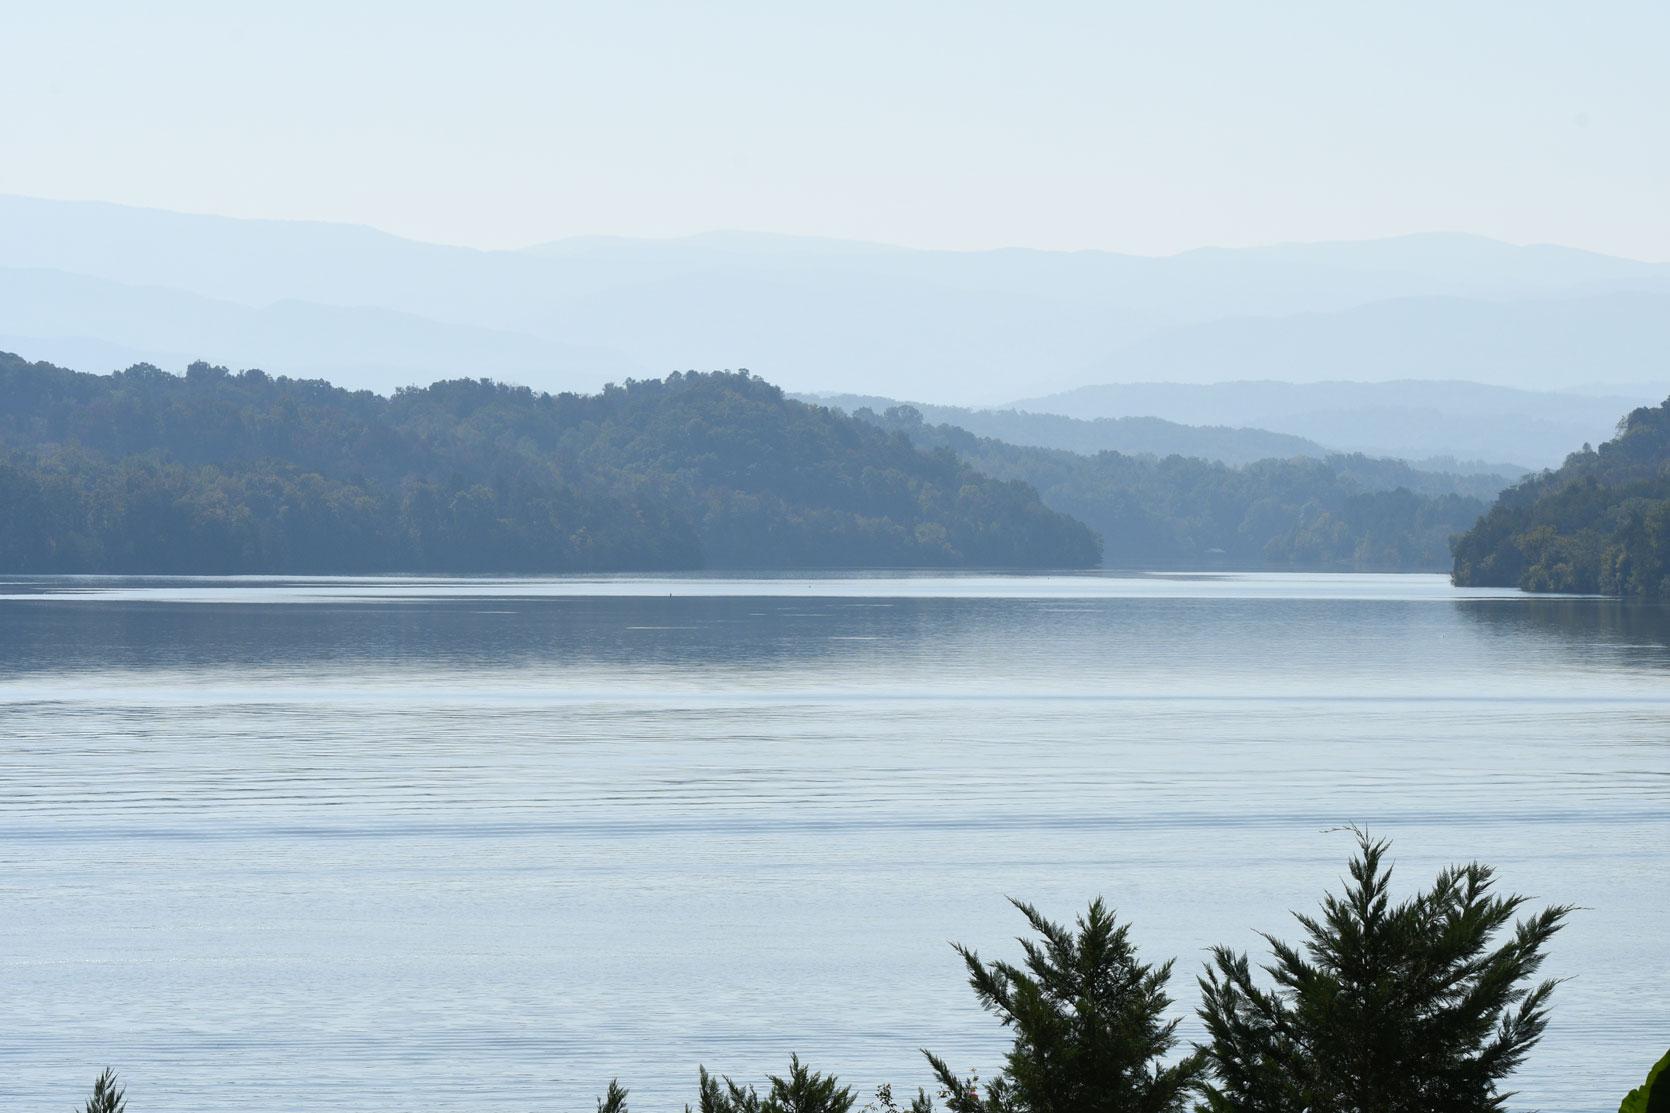 Daytime view of Tellico Lake